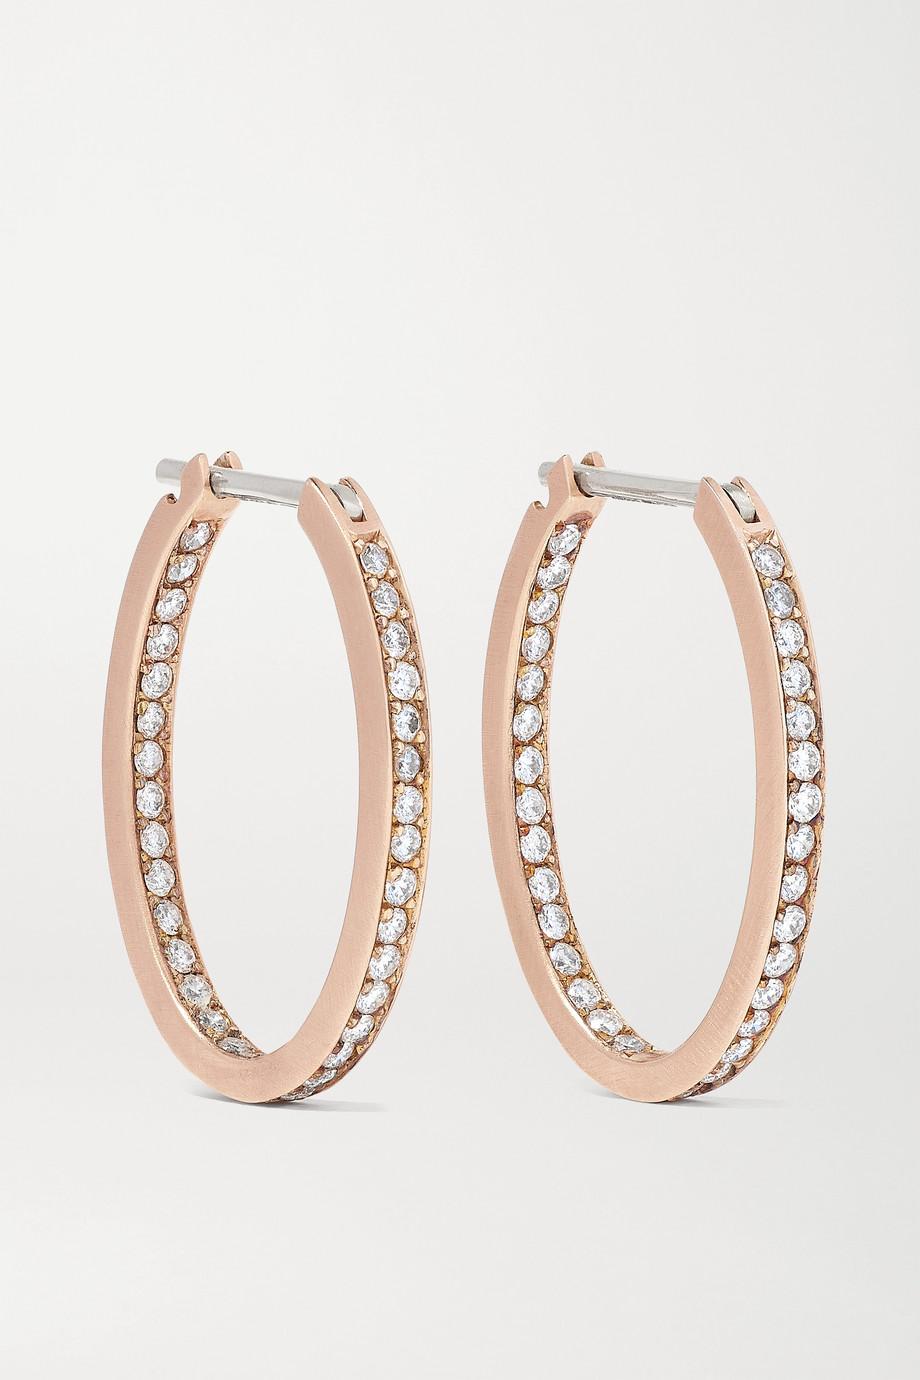 Sylva & Cie Creolen aus 14 Karat Roségold mit Diamanten